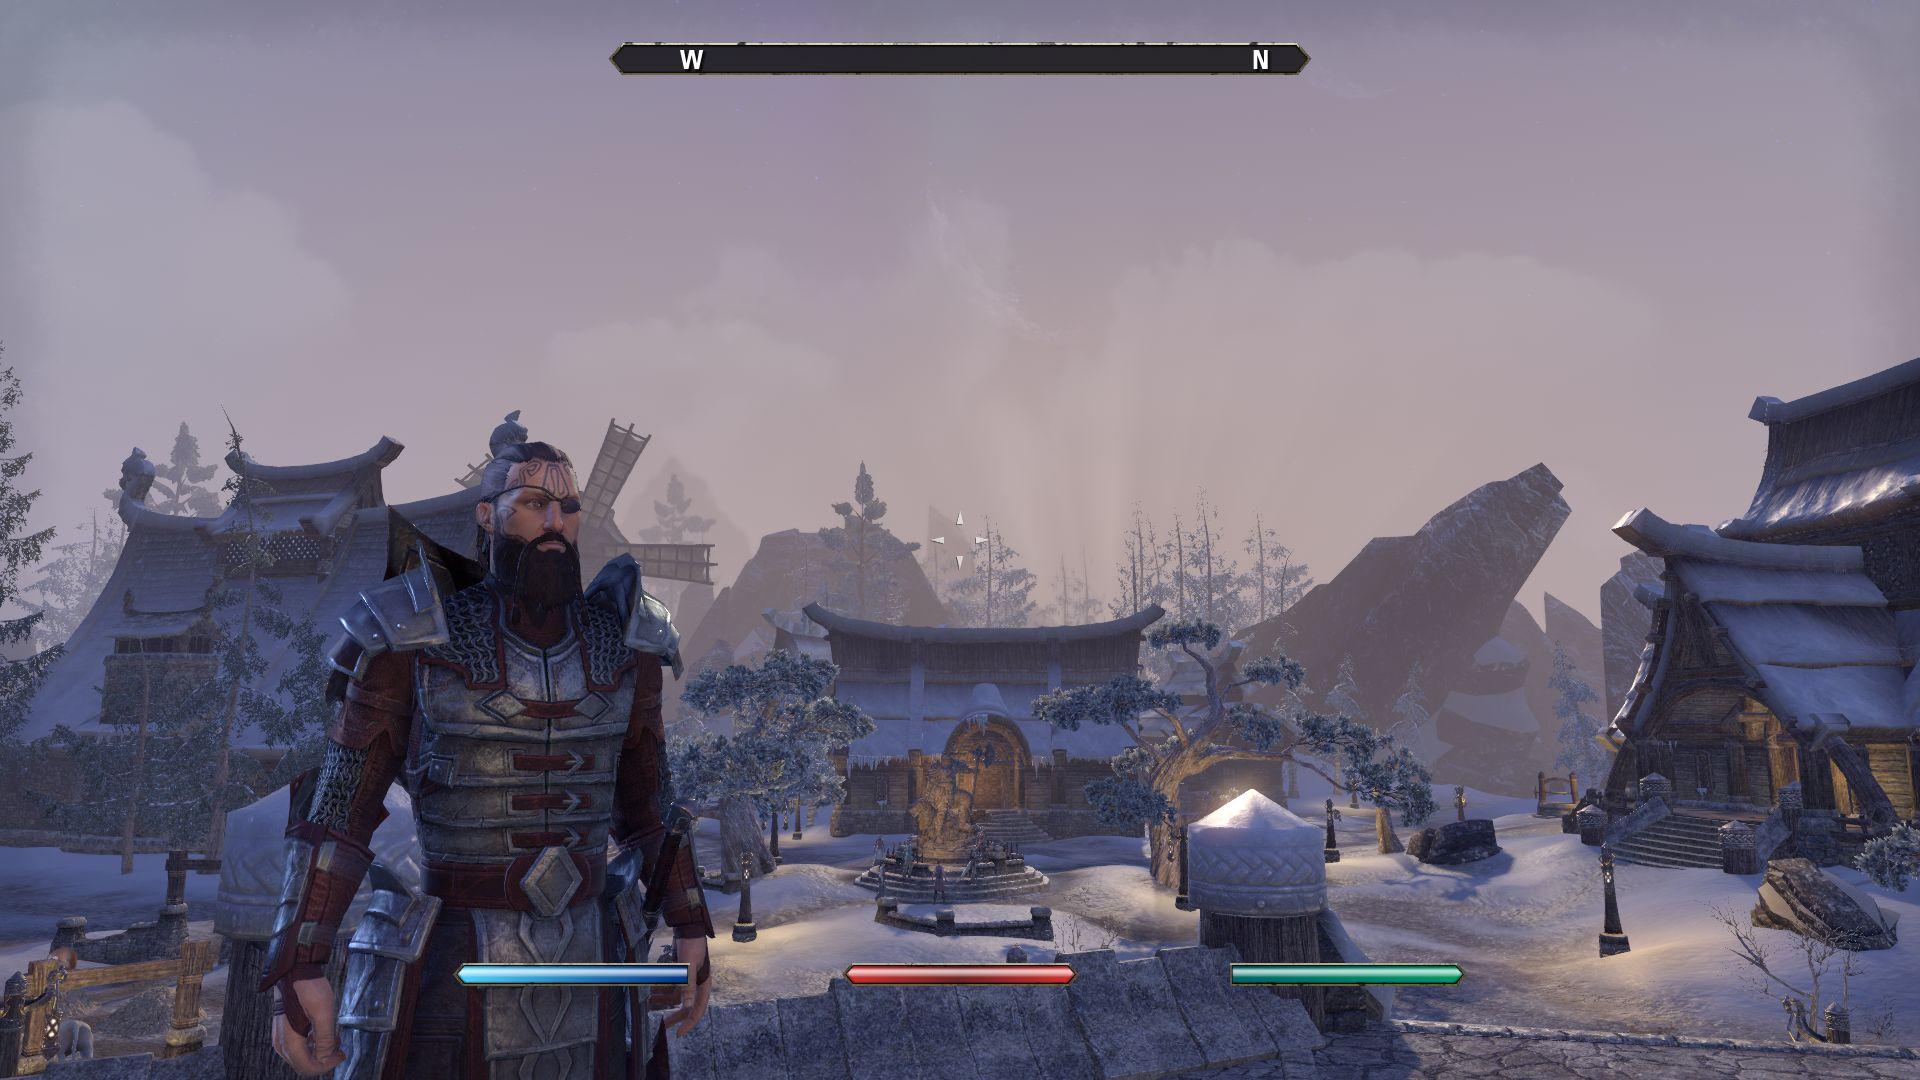 elder-scrolls-online-screenshot-2018-01-21-16-25-16-65